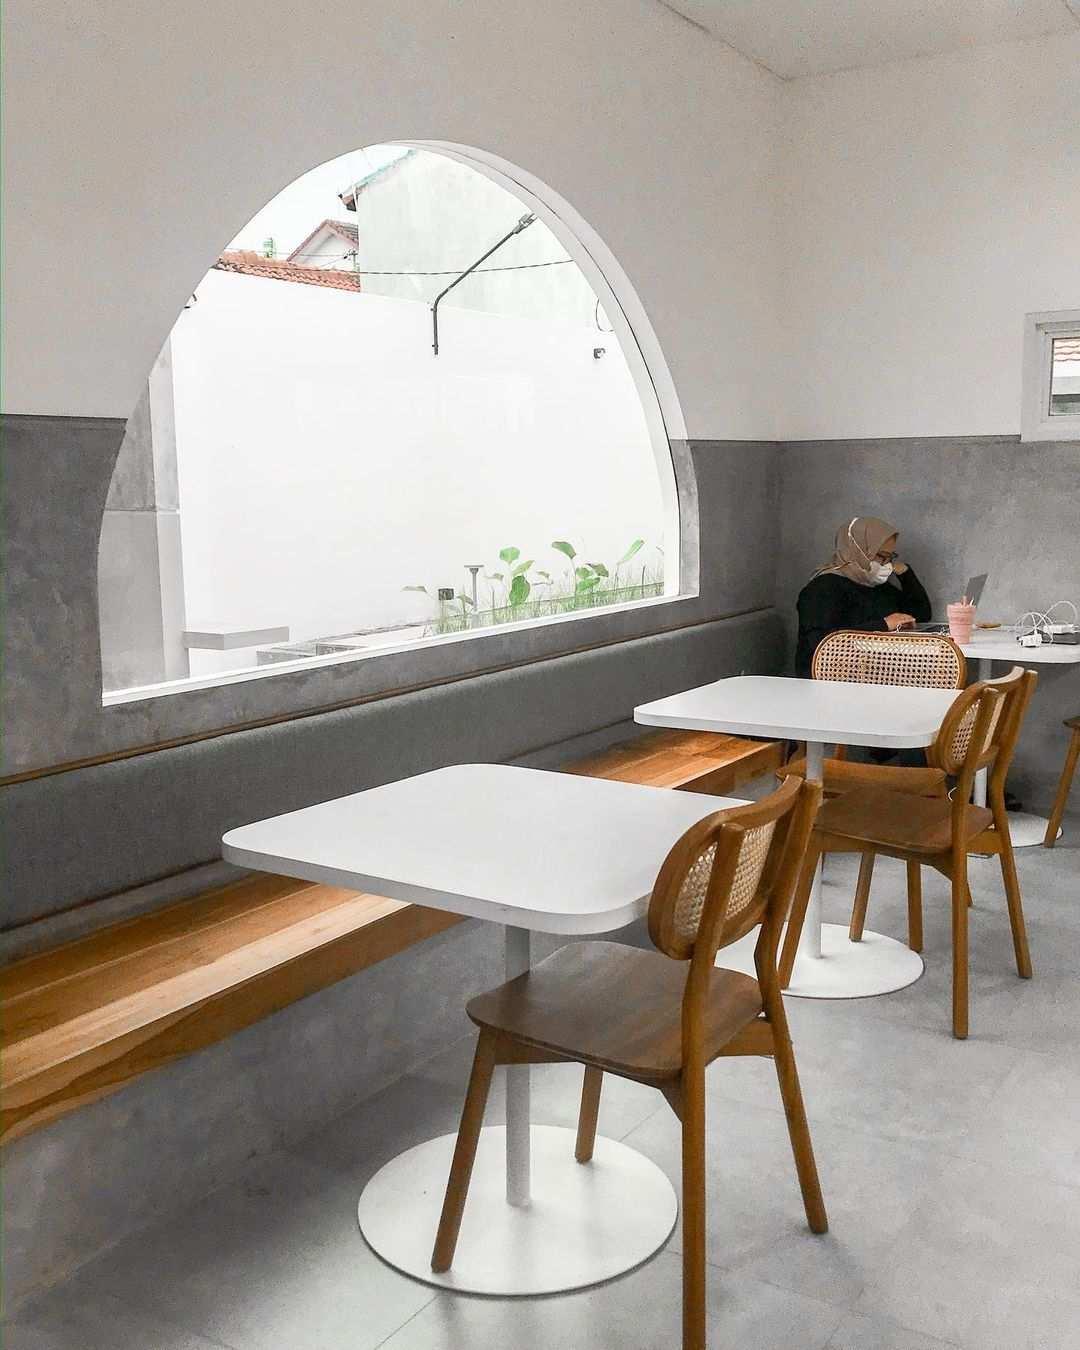 Ruangan Indoor Kopi Snama Solo Image From @cafebyastery